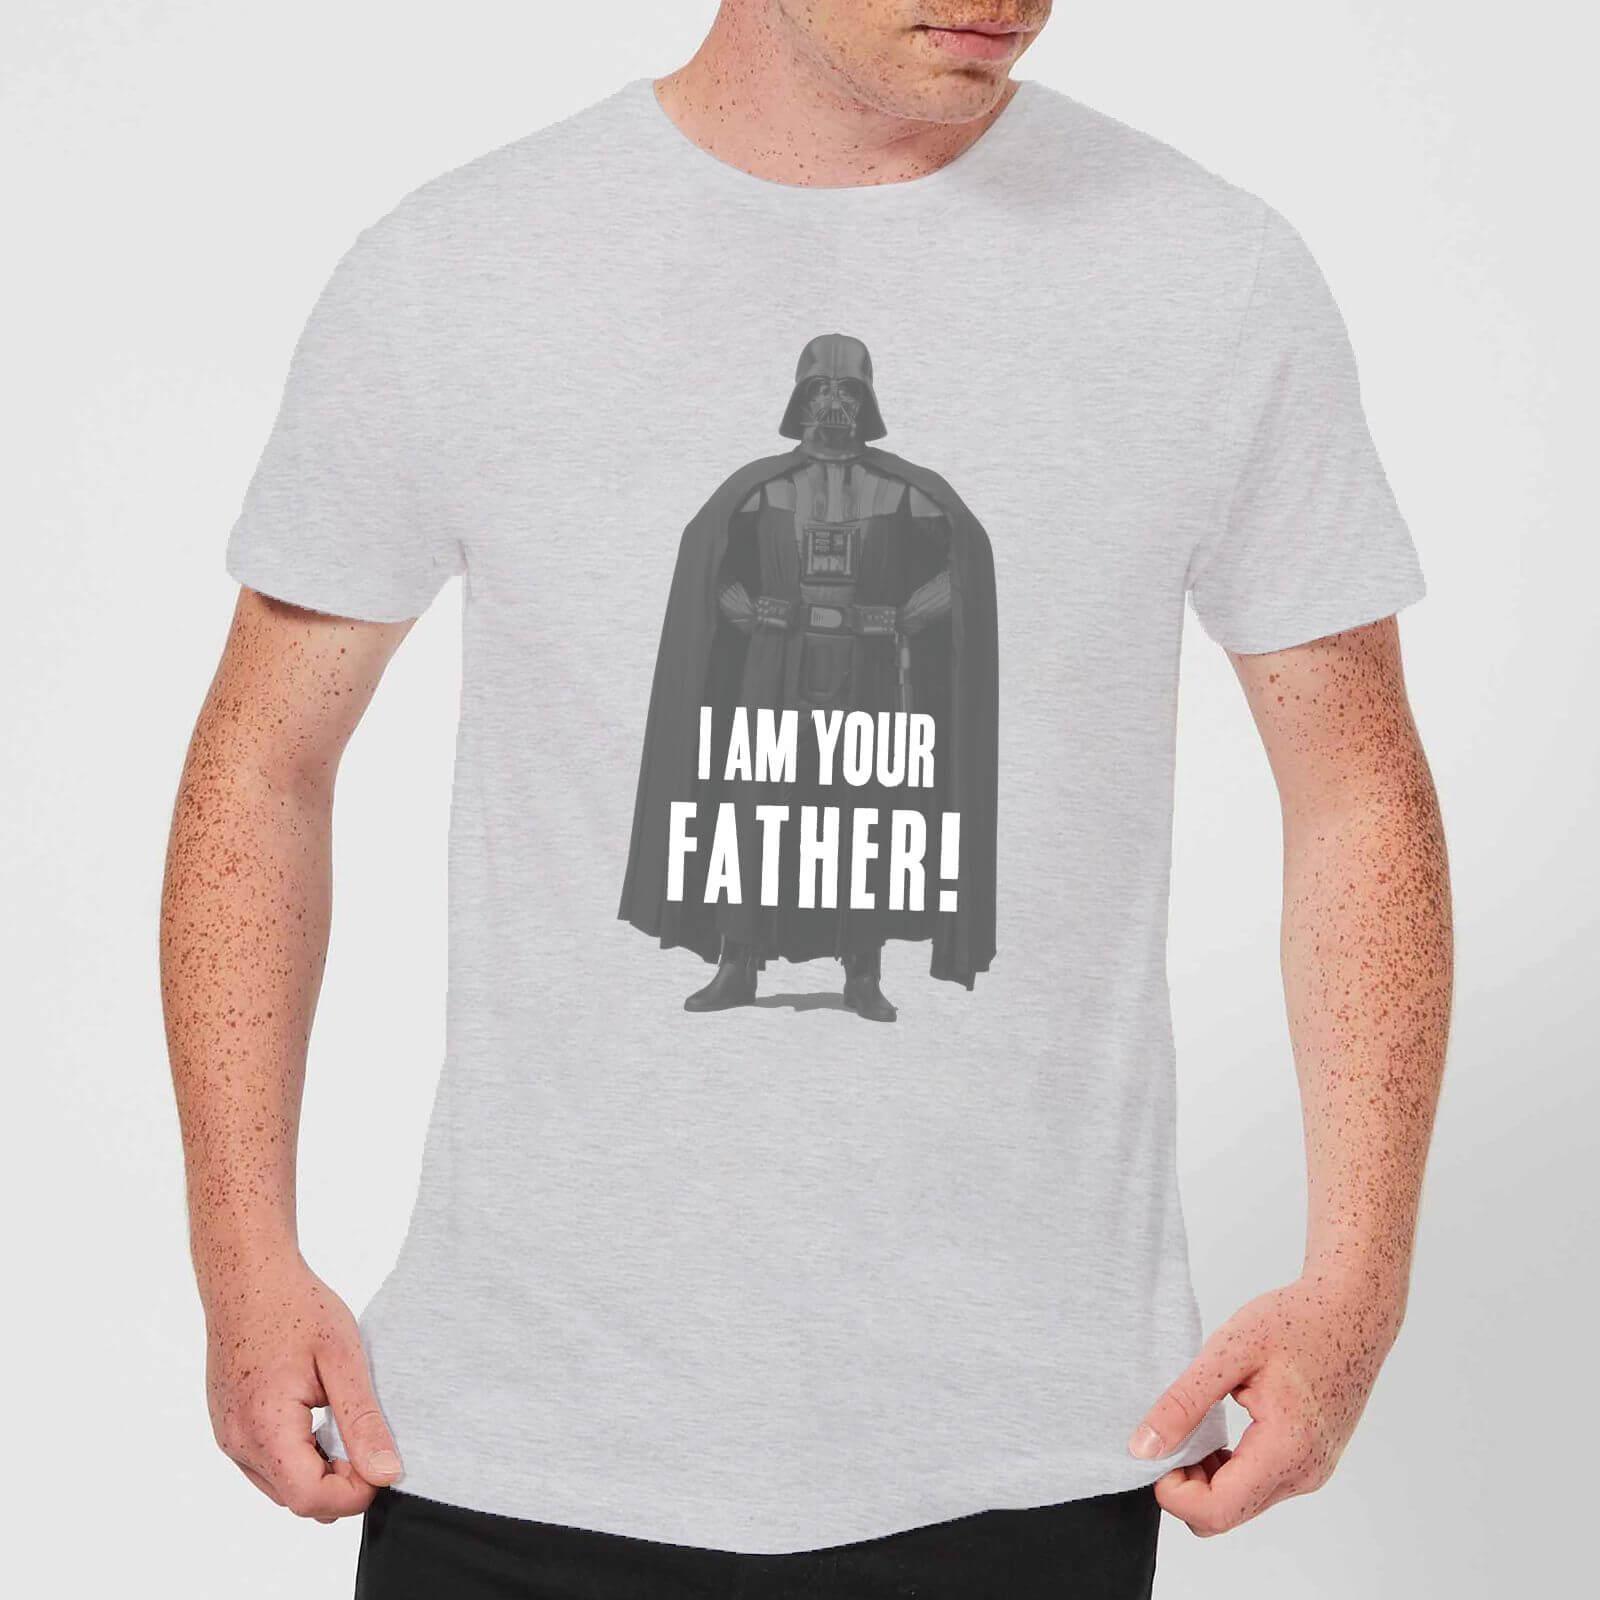 OfferteWeb.click 85-t-shirt-star-wars-darth-vader-i-am-your-father-pose-grigio